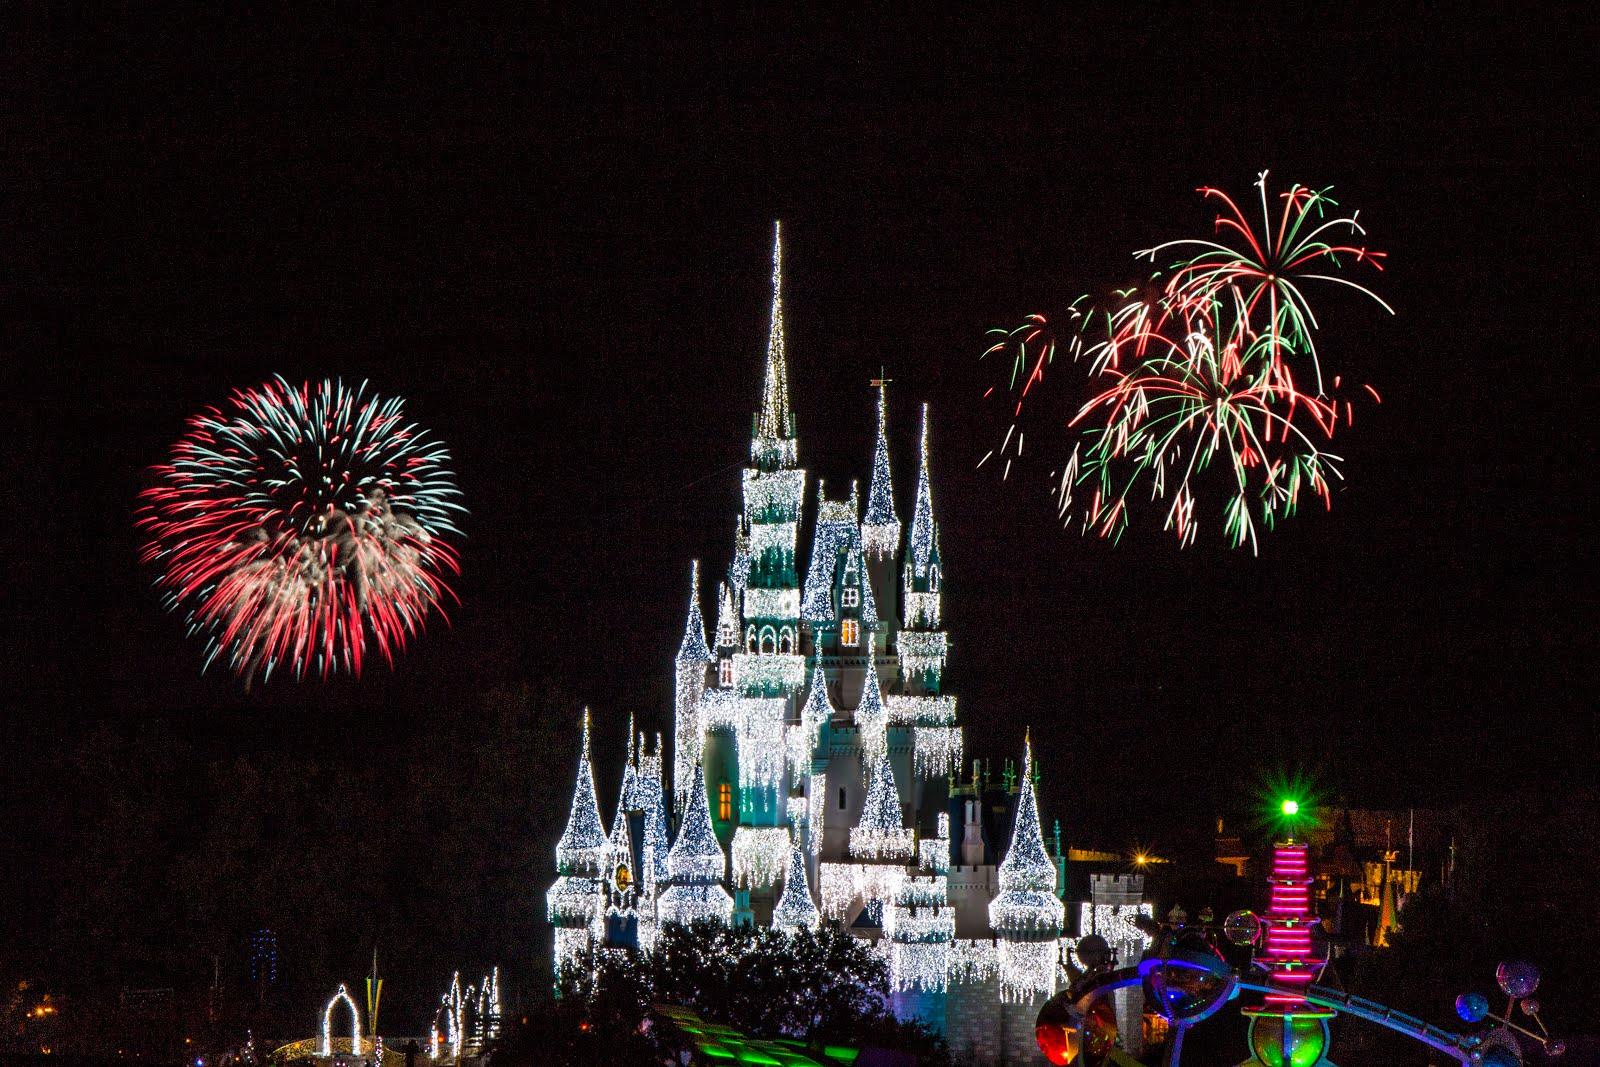 Image De Noel Walt Disney.Wdw Magique Guide Des Fetes A Walt Disney World